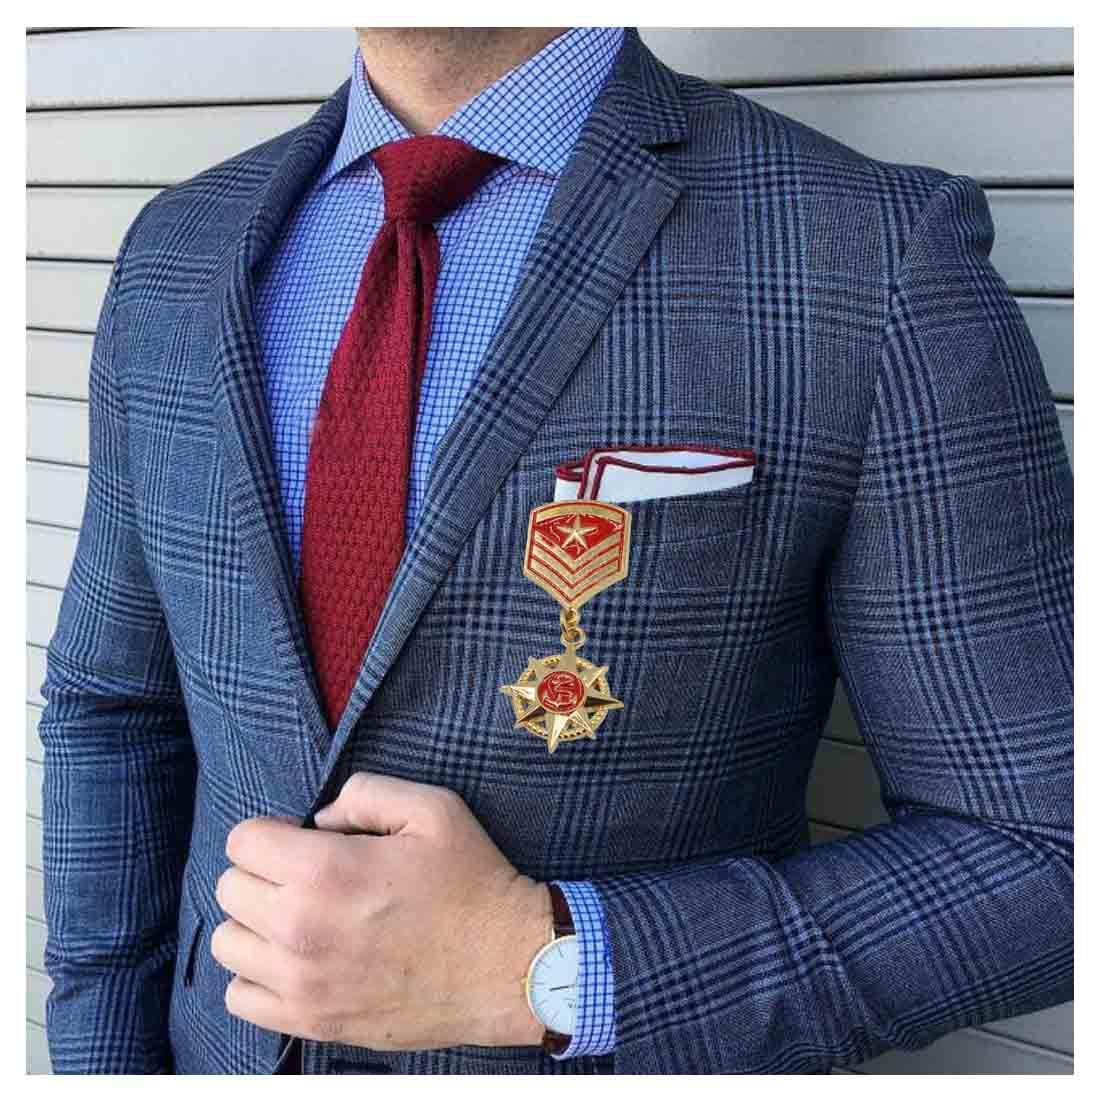 ... Sullery Party Gift Anchor Star Navy Medal Brooch Pin Badge Lapel Pin  Brooch For Men Women ...